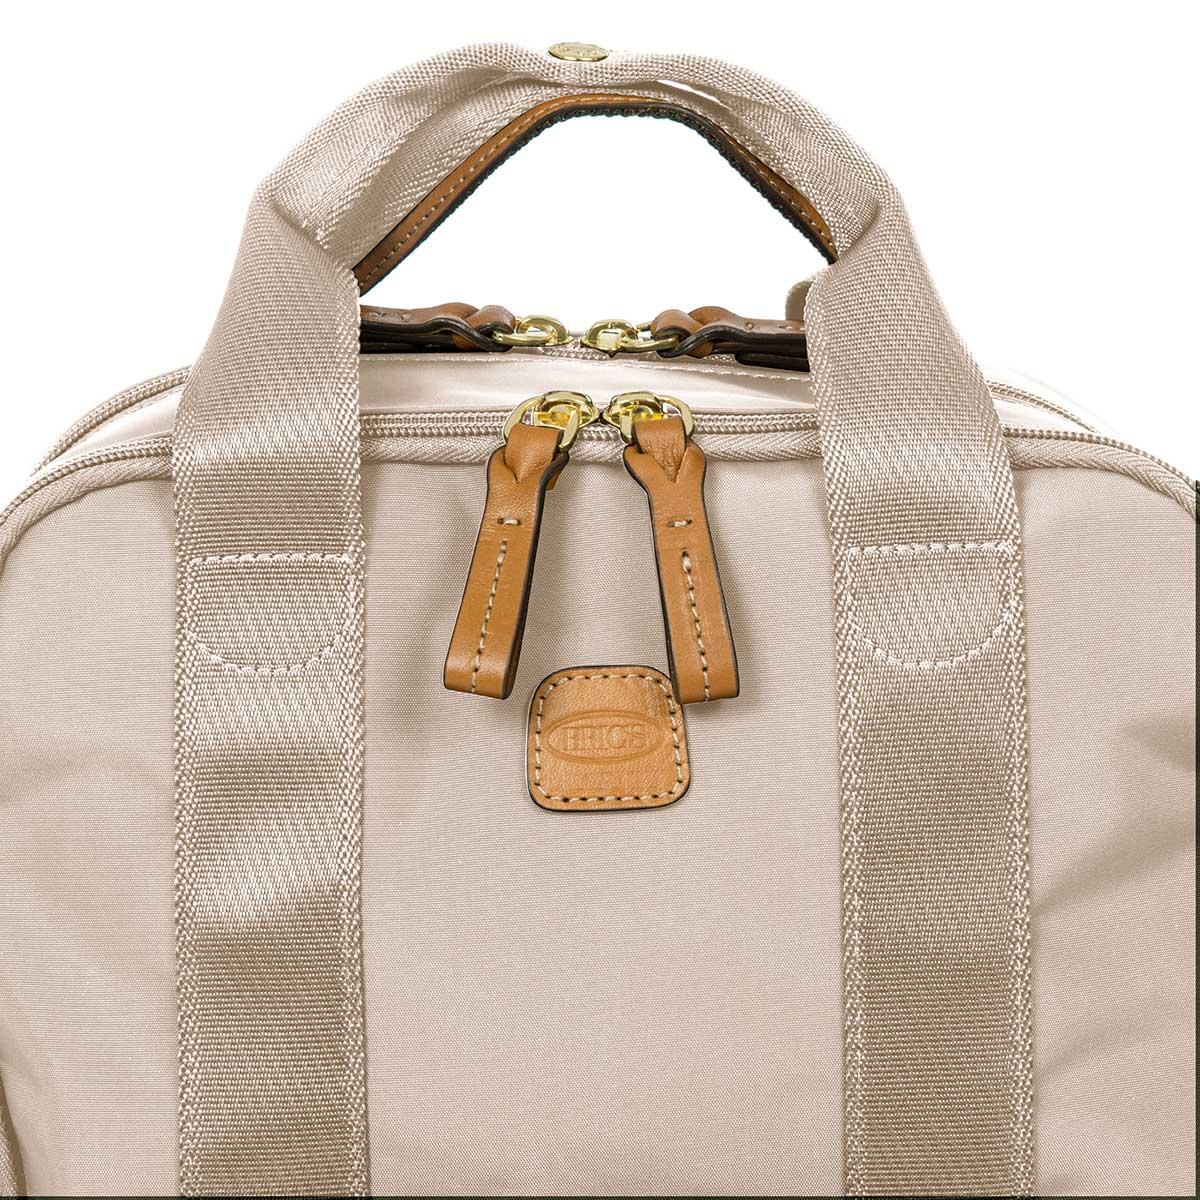 X-bag Urban Backpack - Papyrus   BRIC'S Travel Bags